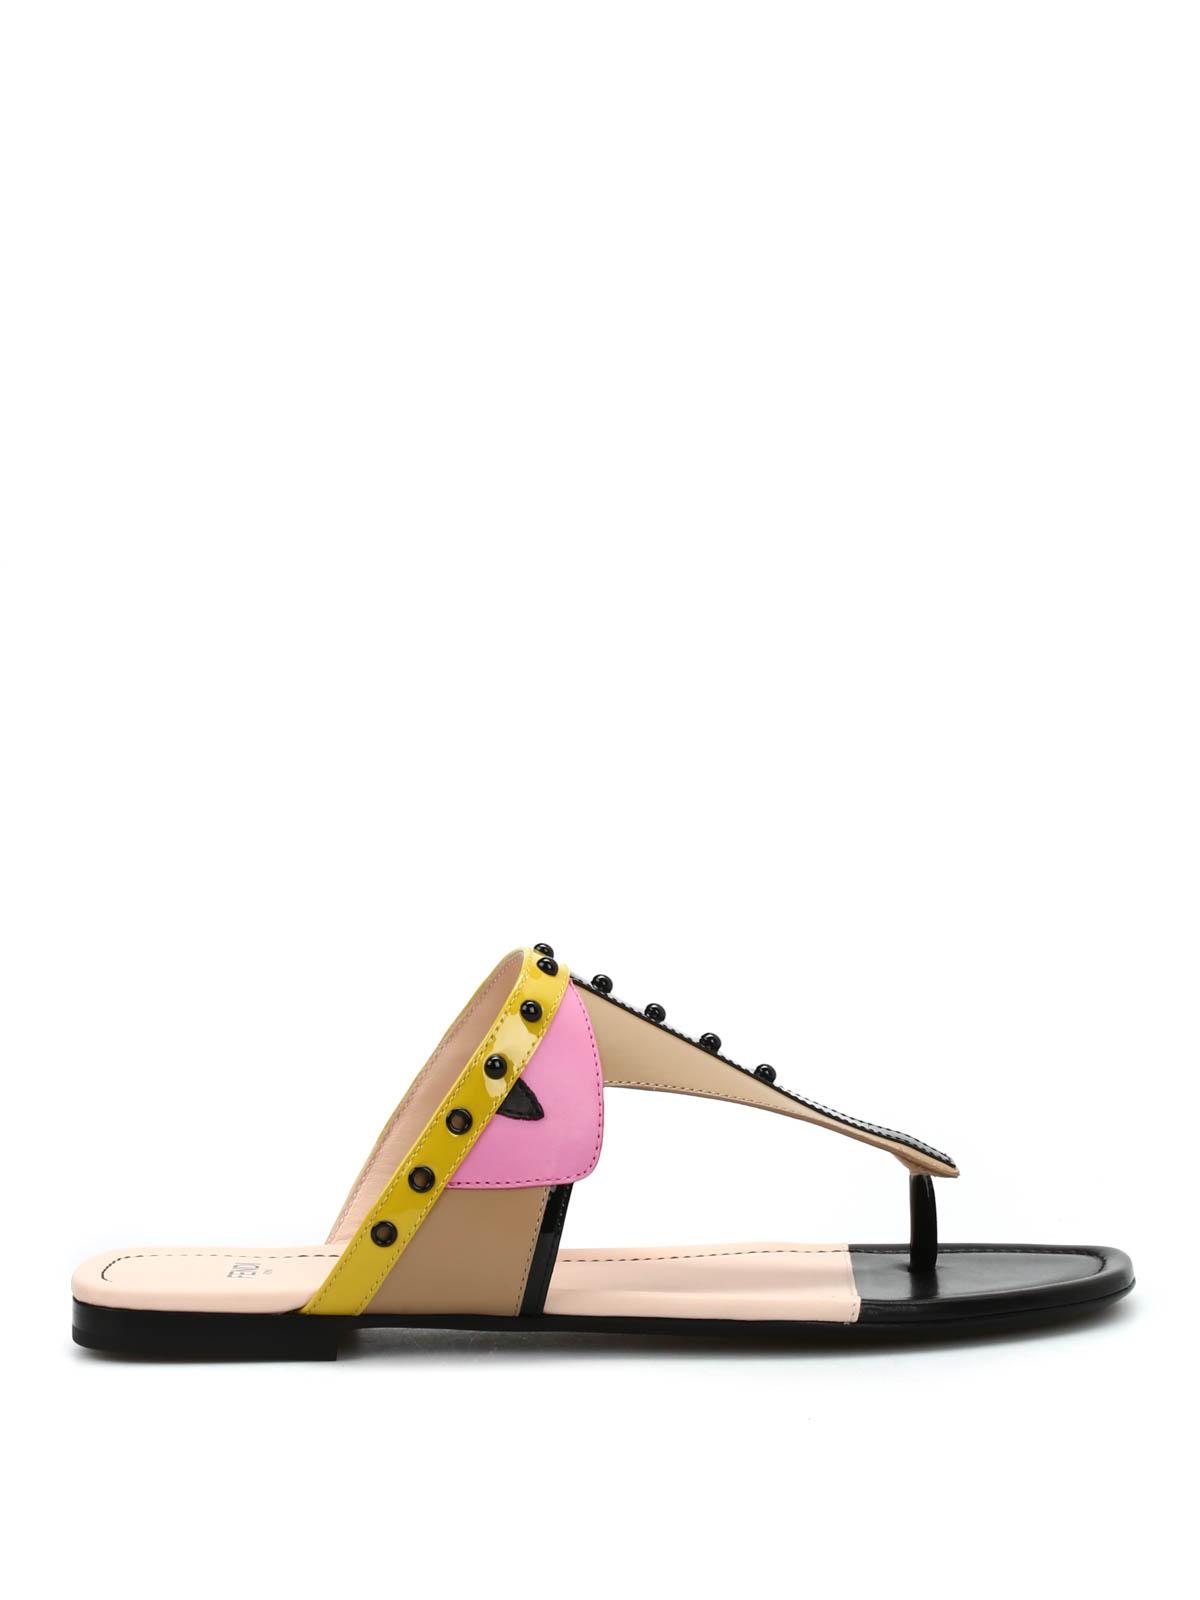 Flip Flops Sandals By Fendi - Sandals  Ikrix-4039